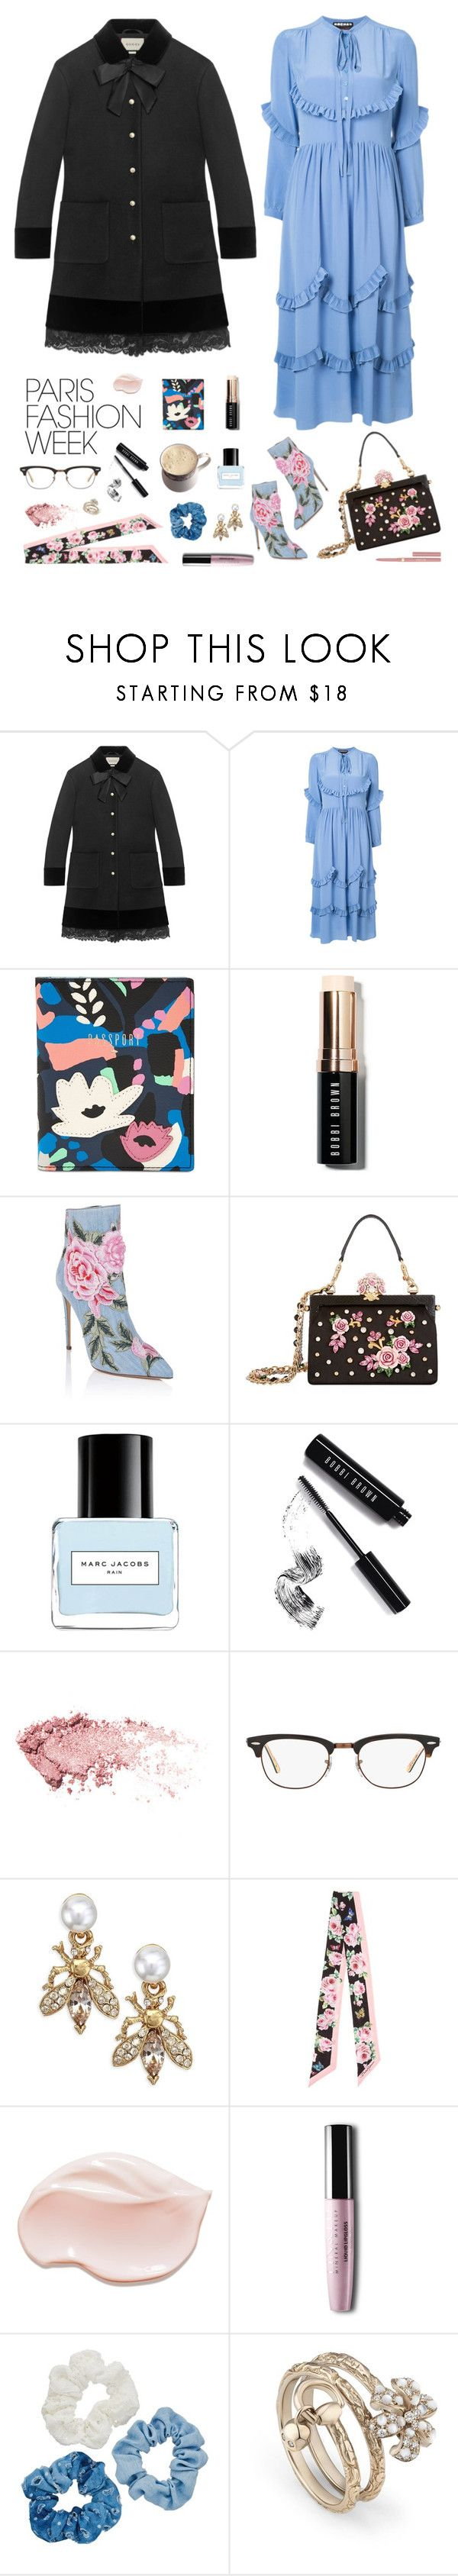 """paris pastels"" by hist24jpcs ❤ liked on Polyvore featuring Gucci, Rochas, FOSSIL, Bobbi Brown Cosmetics, Dolce&Gabbana, Marc Jacobs, Ray-Ban, Oscar de la Renta, Mudd and Stila"